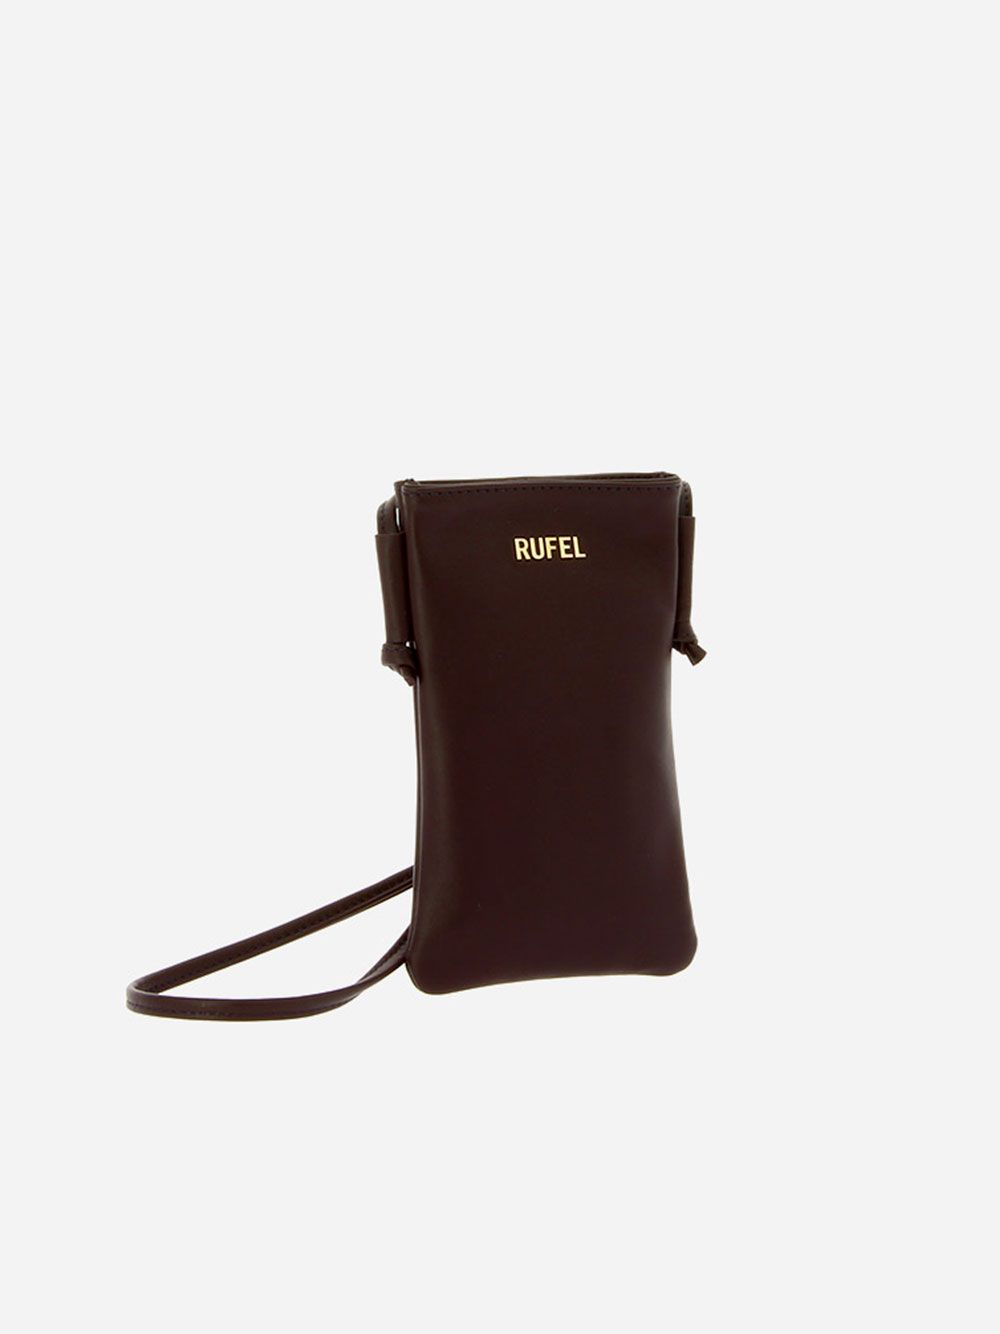 Small Brown Crossbody Bag   Rufel